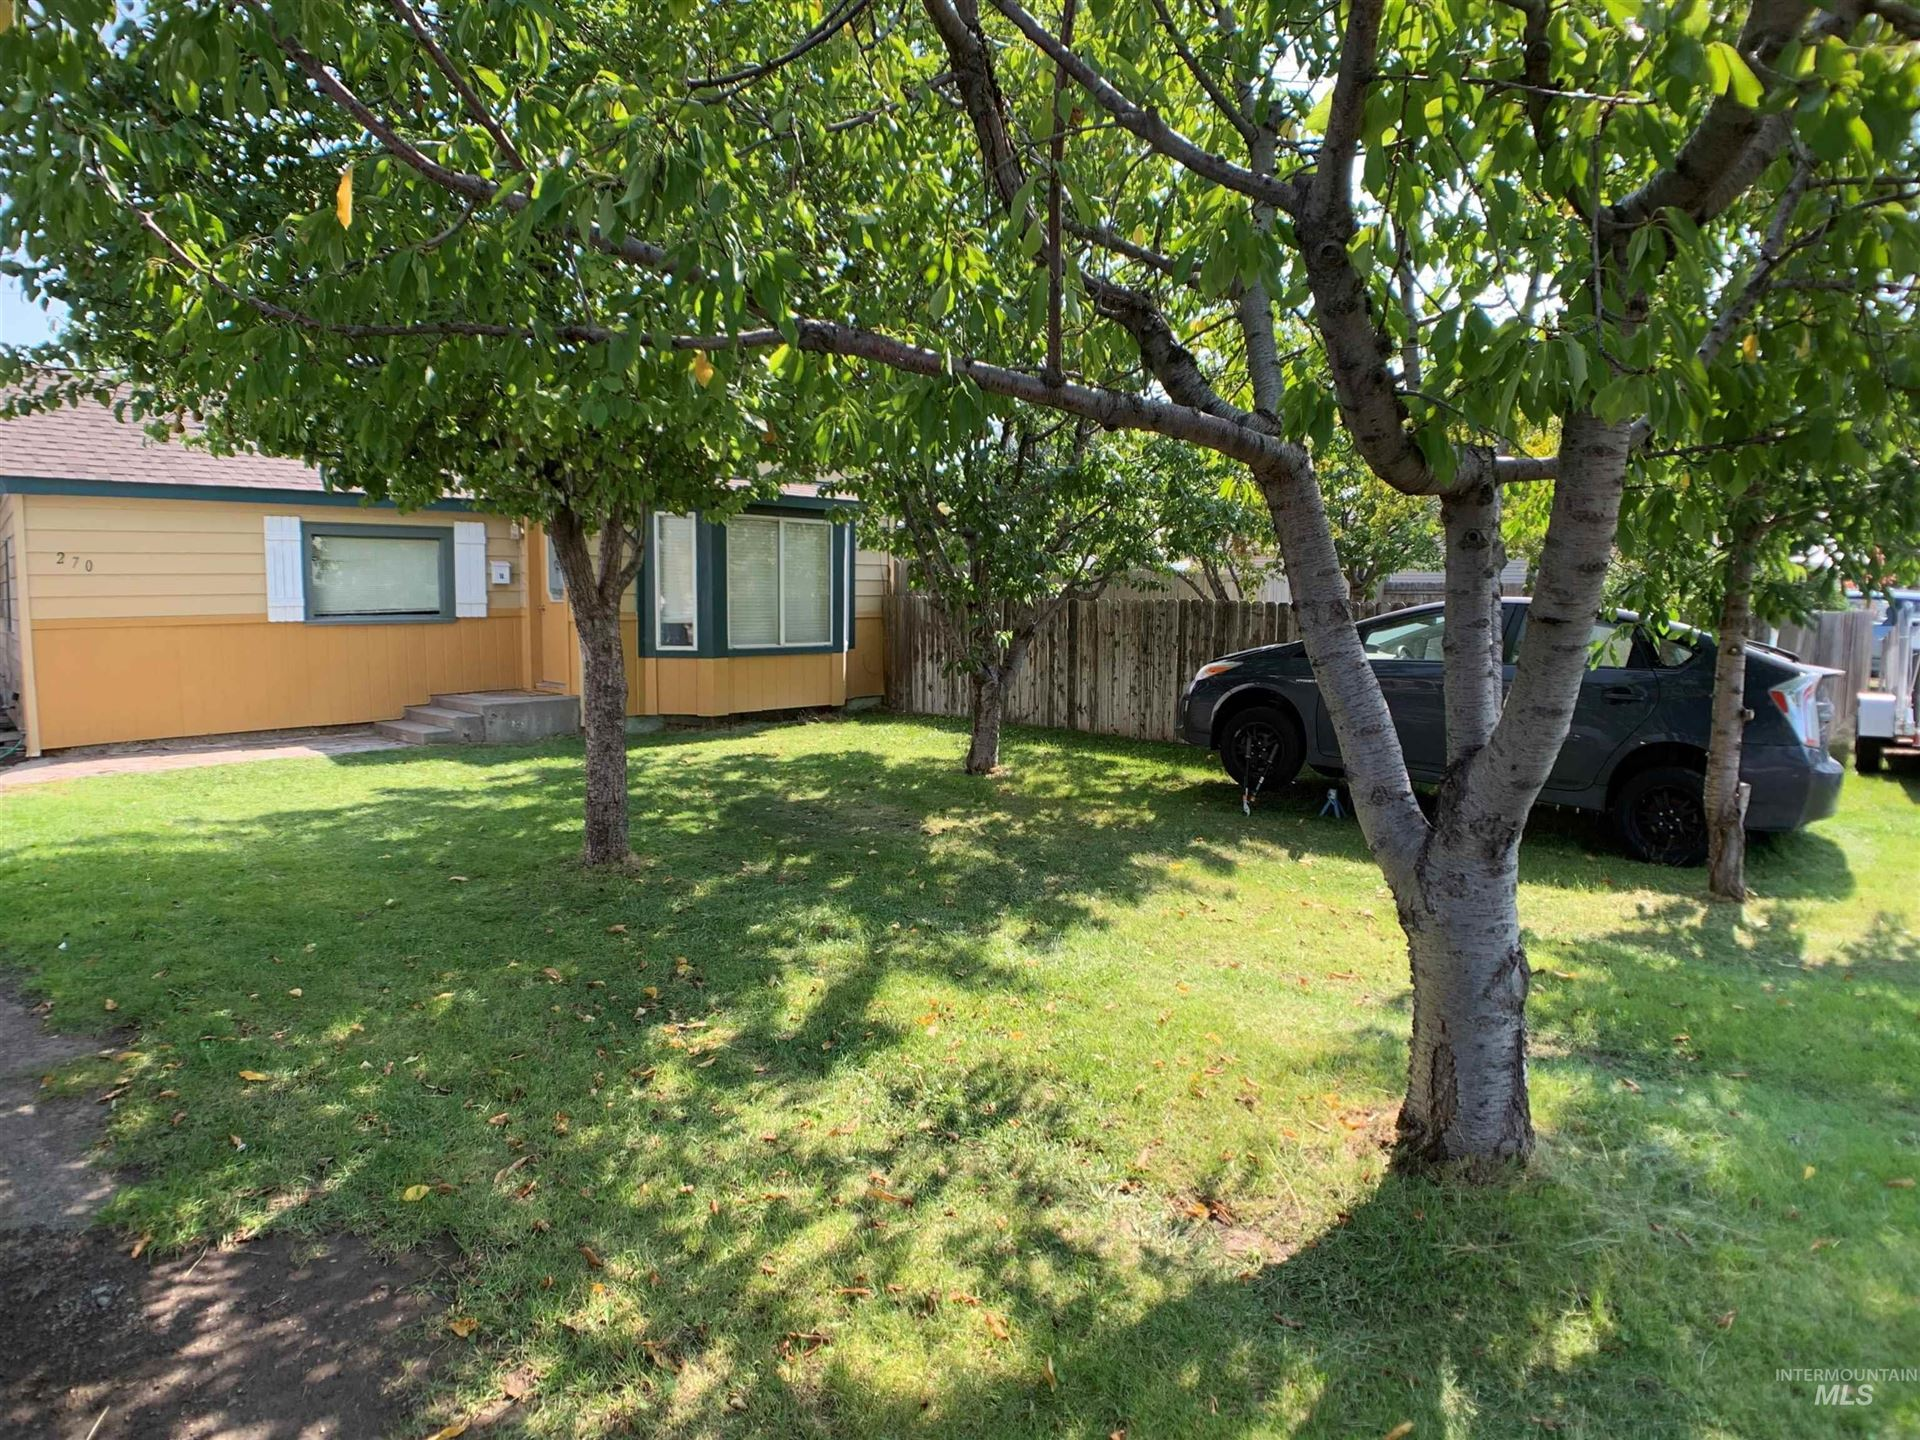 Photo of 270 Maurice Street, Twin Falls, ID 83301 (MLS # 98819265)